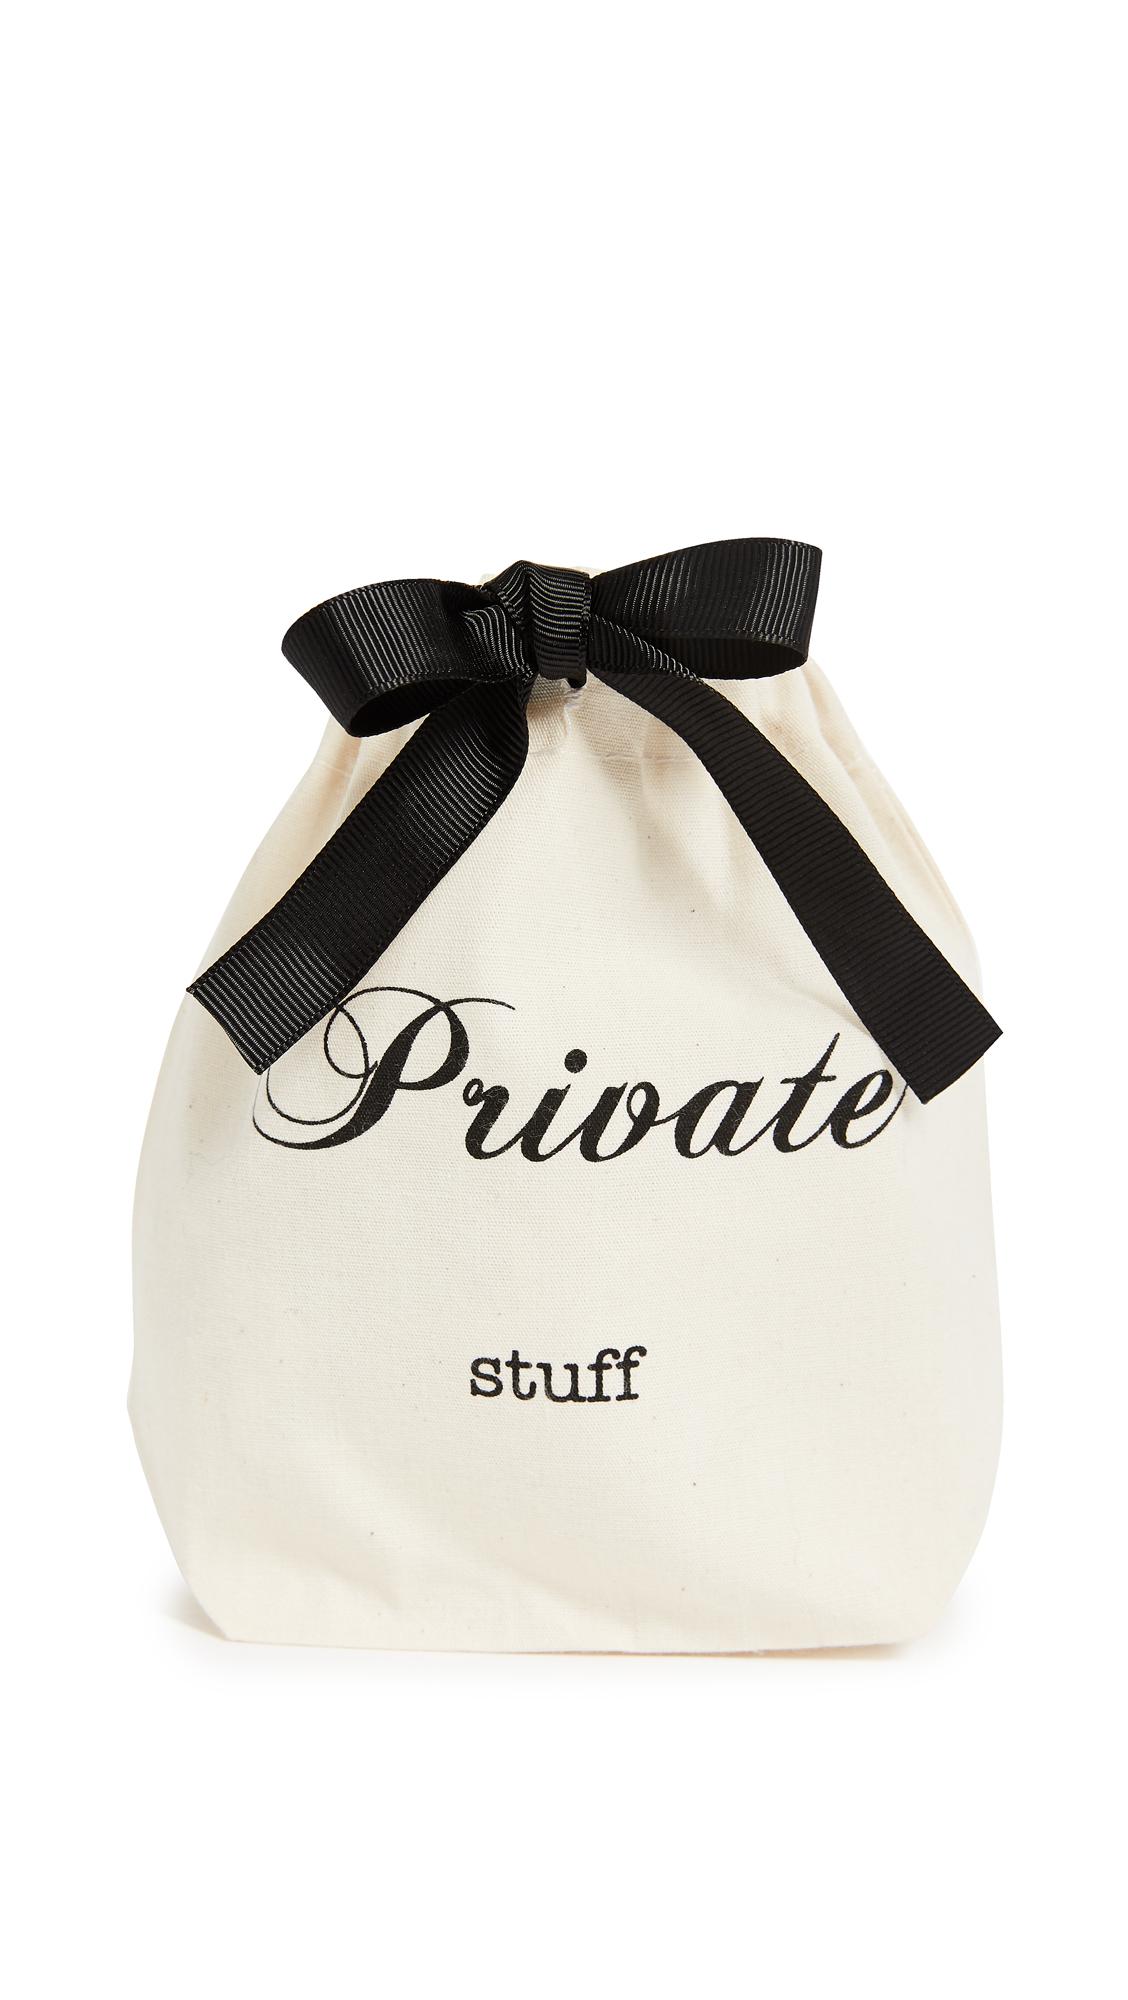 Bag-all Private Stuff Small Organizing Bag - Natural/Black